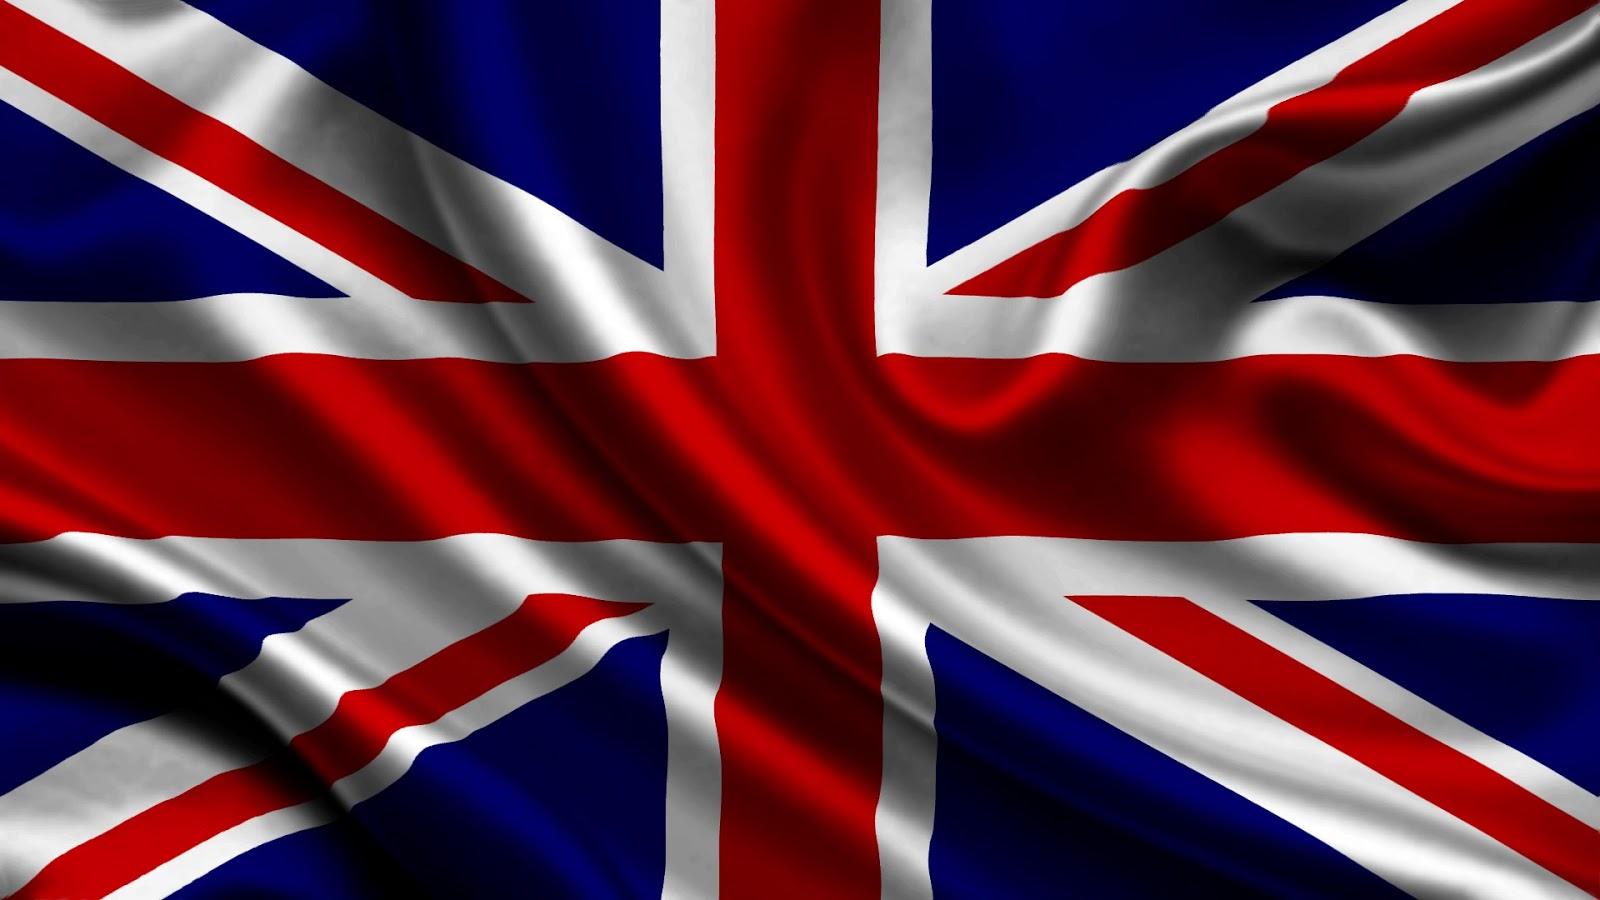 England Flag Colors Represent The Flag Of England 1